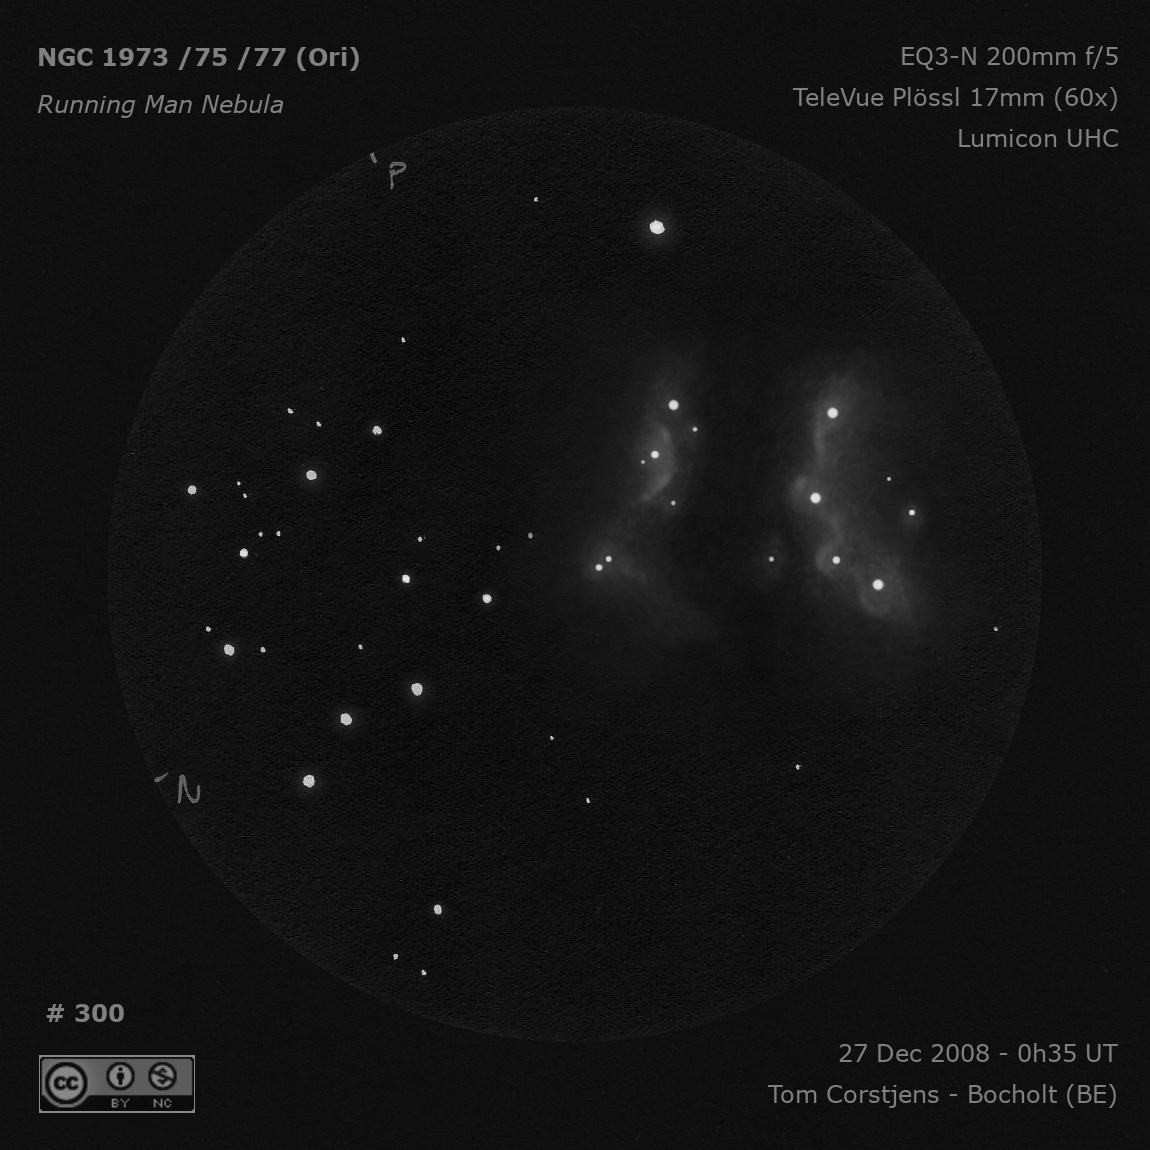 VCSE - NGC 1975 - Tom Corstjens - Helios Newton 20cm f/5.0 (200 mm) - http://www.deepskylog.org/